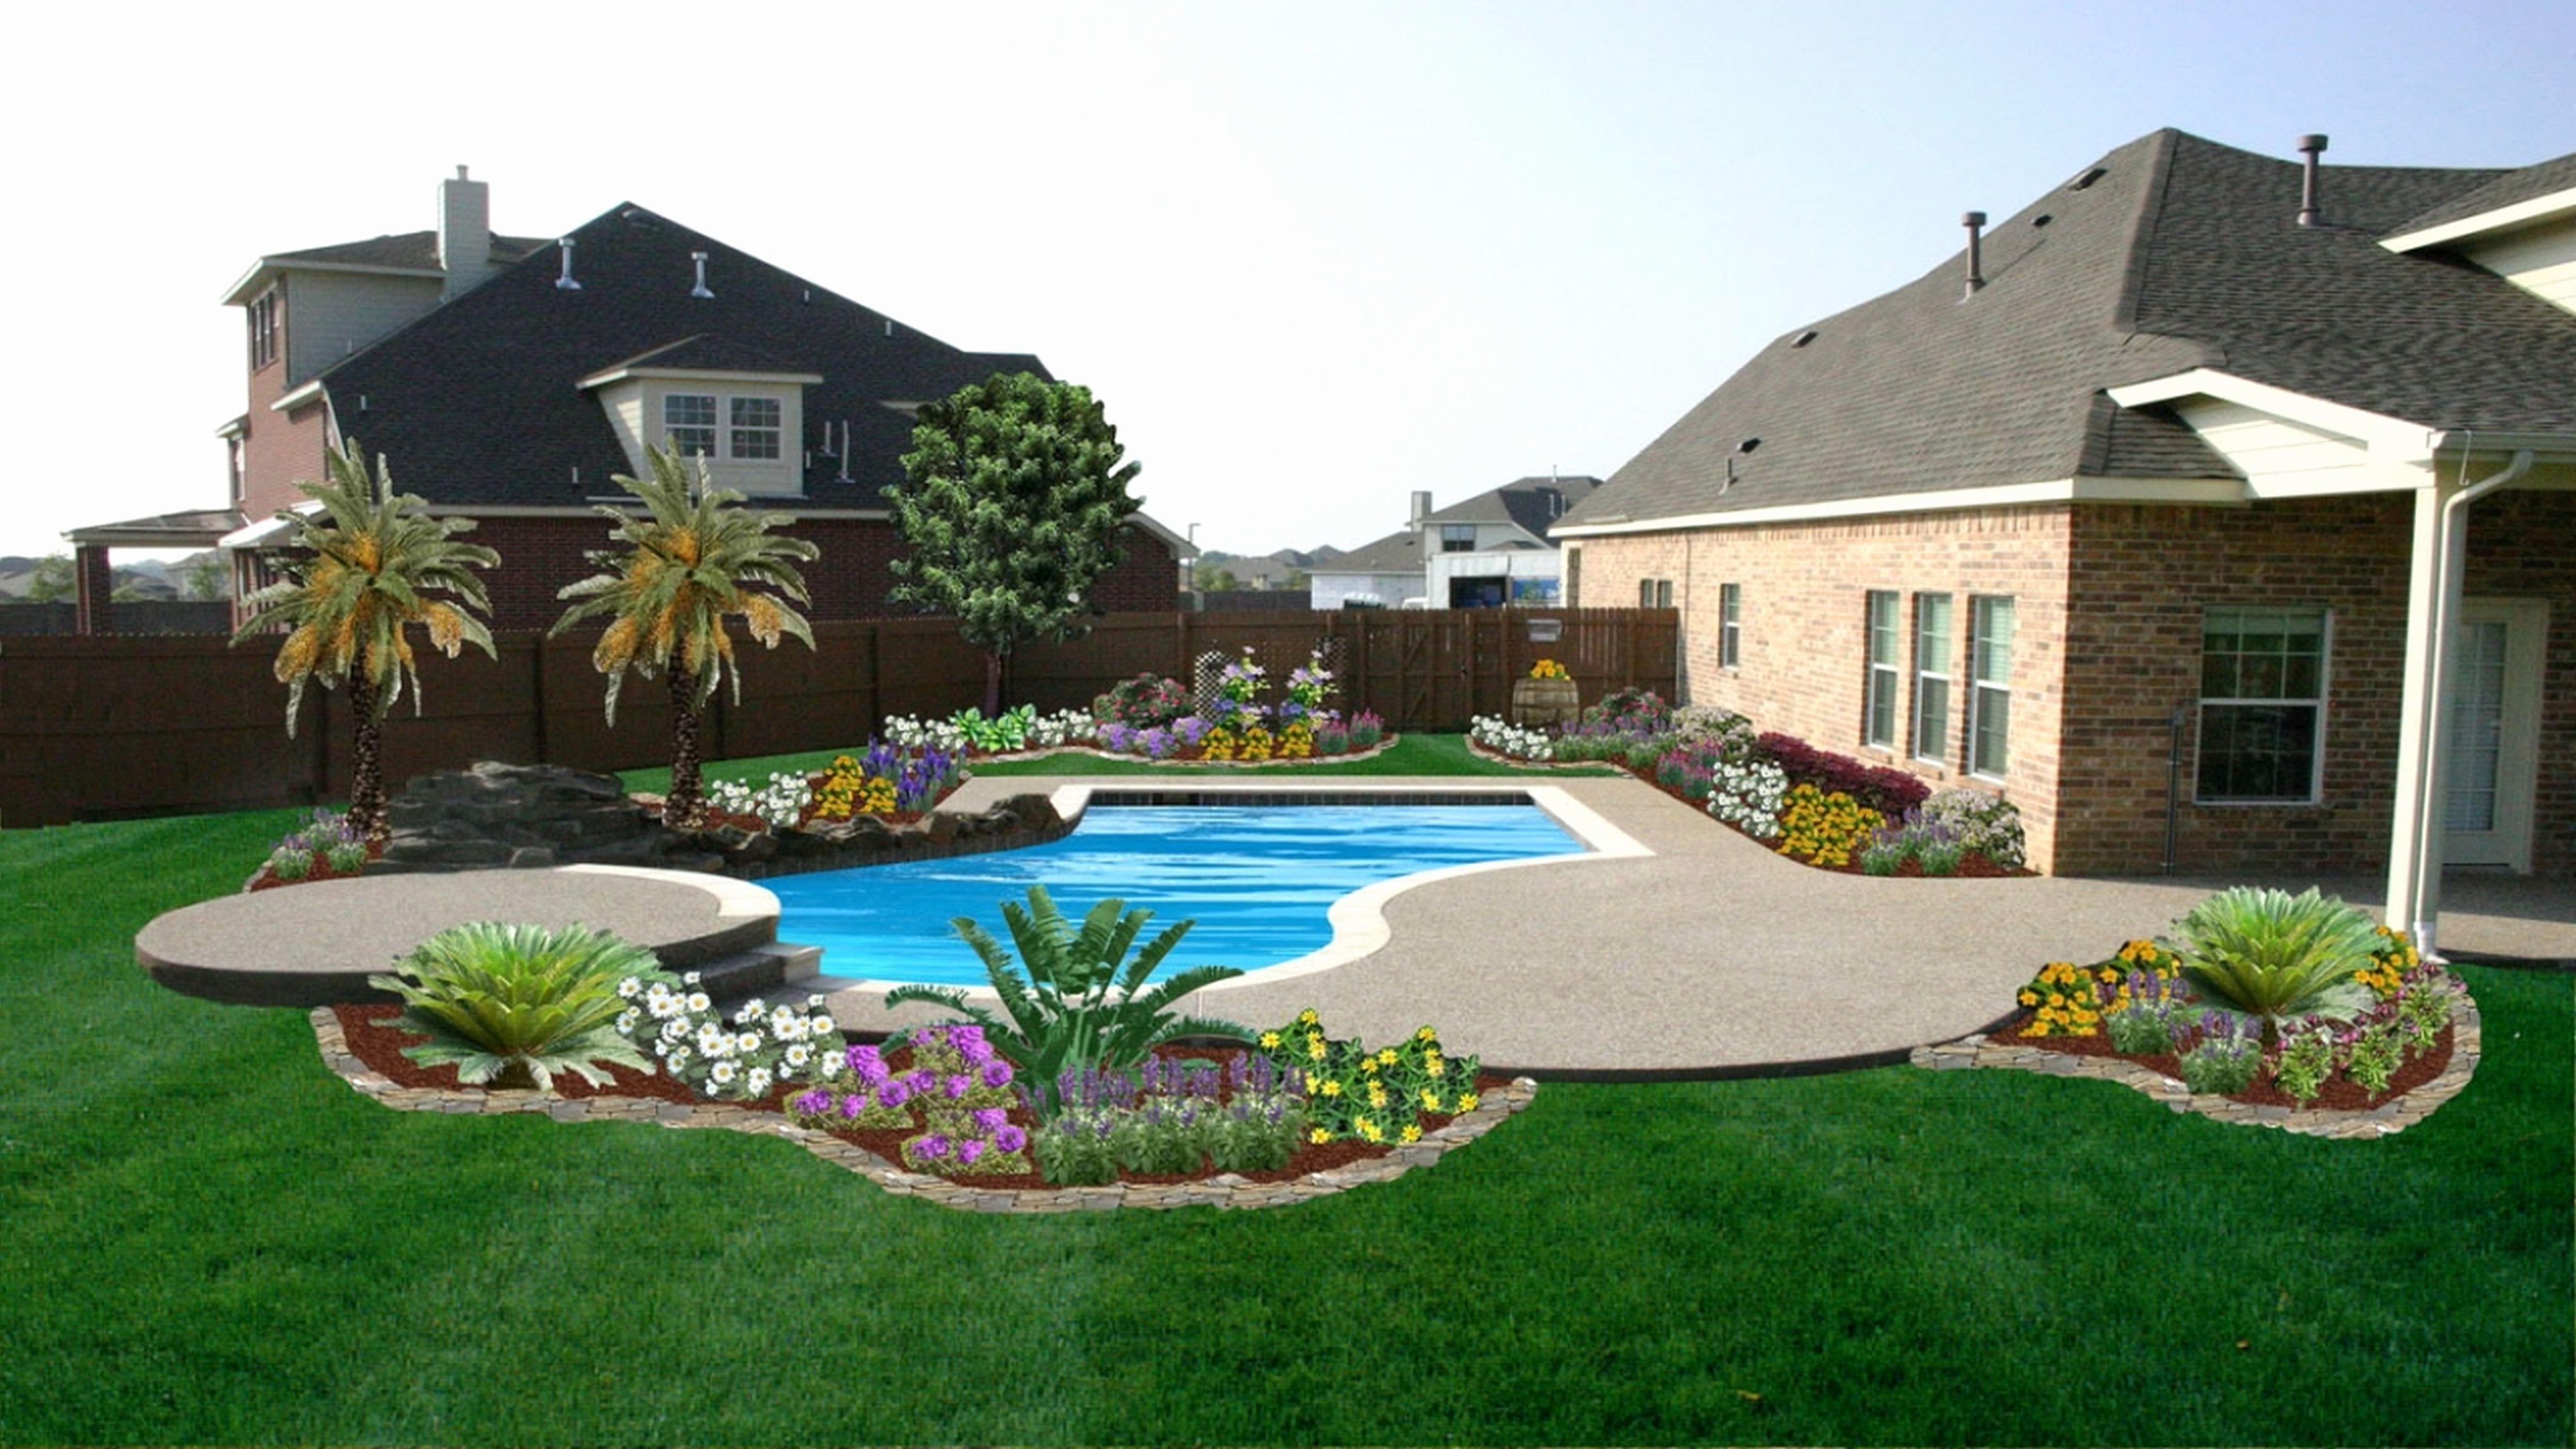 Landscape Ideas Around Pool Beautiful Backyard Landscaping Ideas Around Pool Simple Backyard Pool Landscaping Large Backyard Landscaping Pool Landscape Design